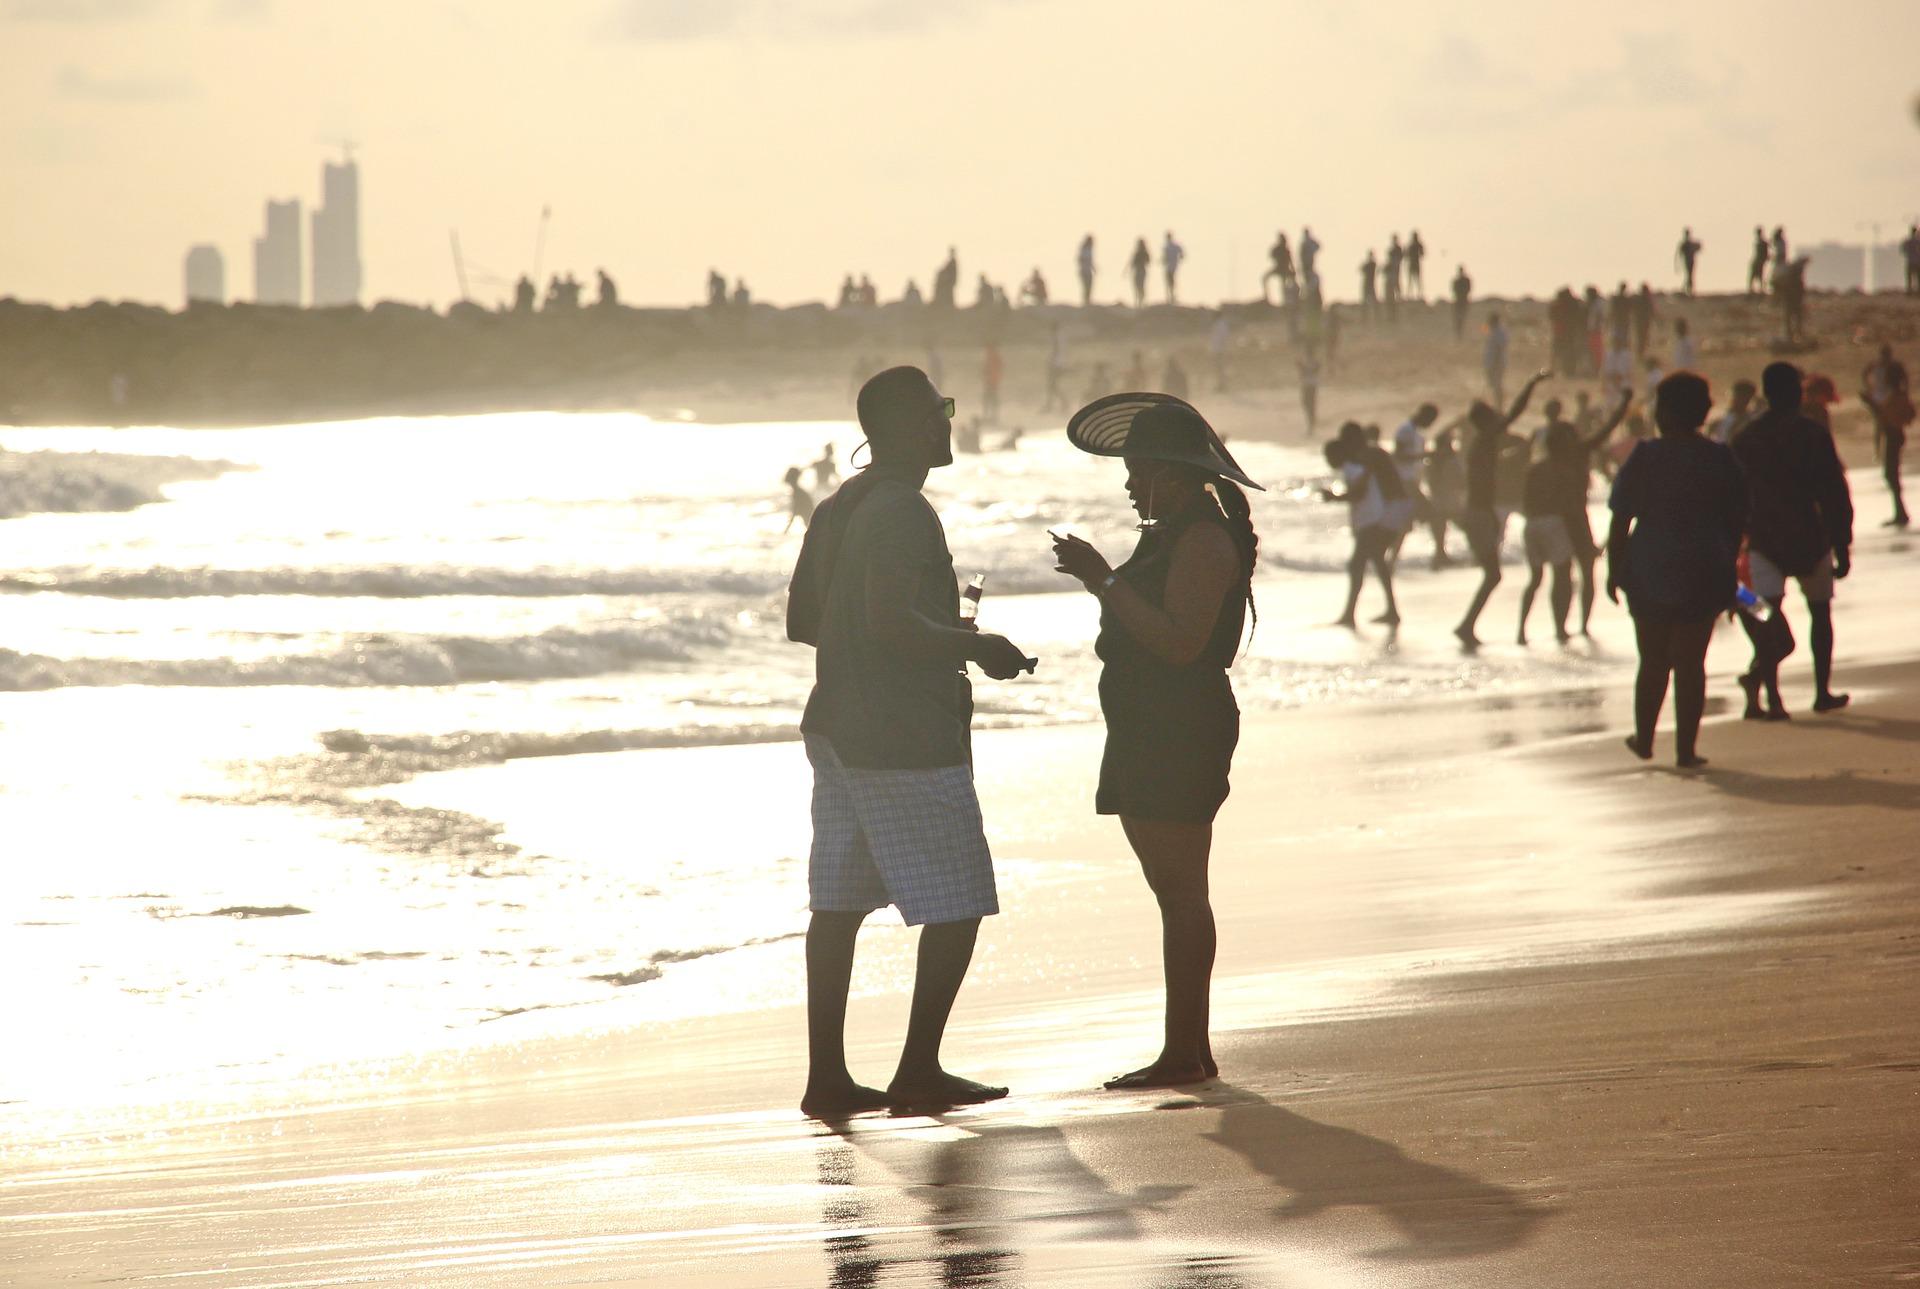 Image of a beach in Lagos, Nigeria